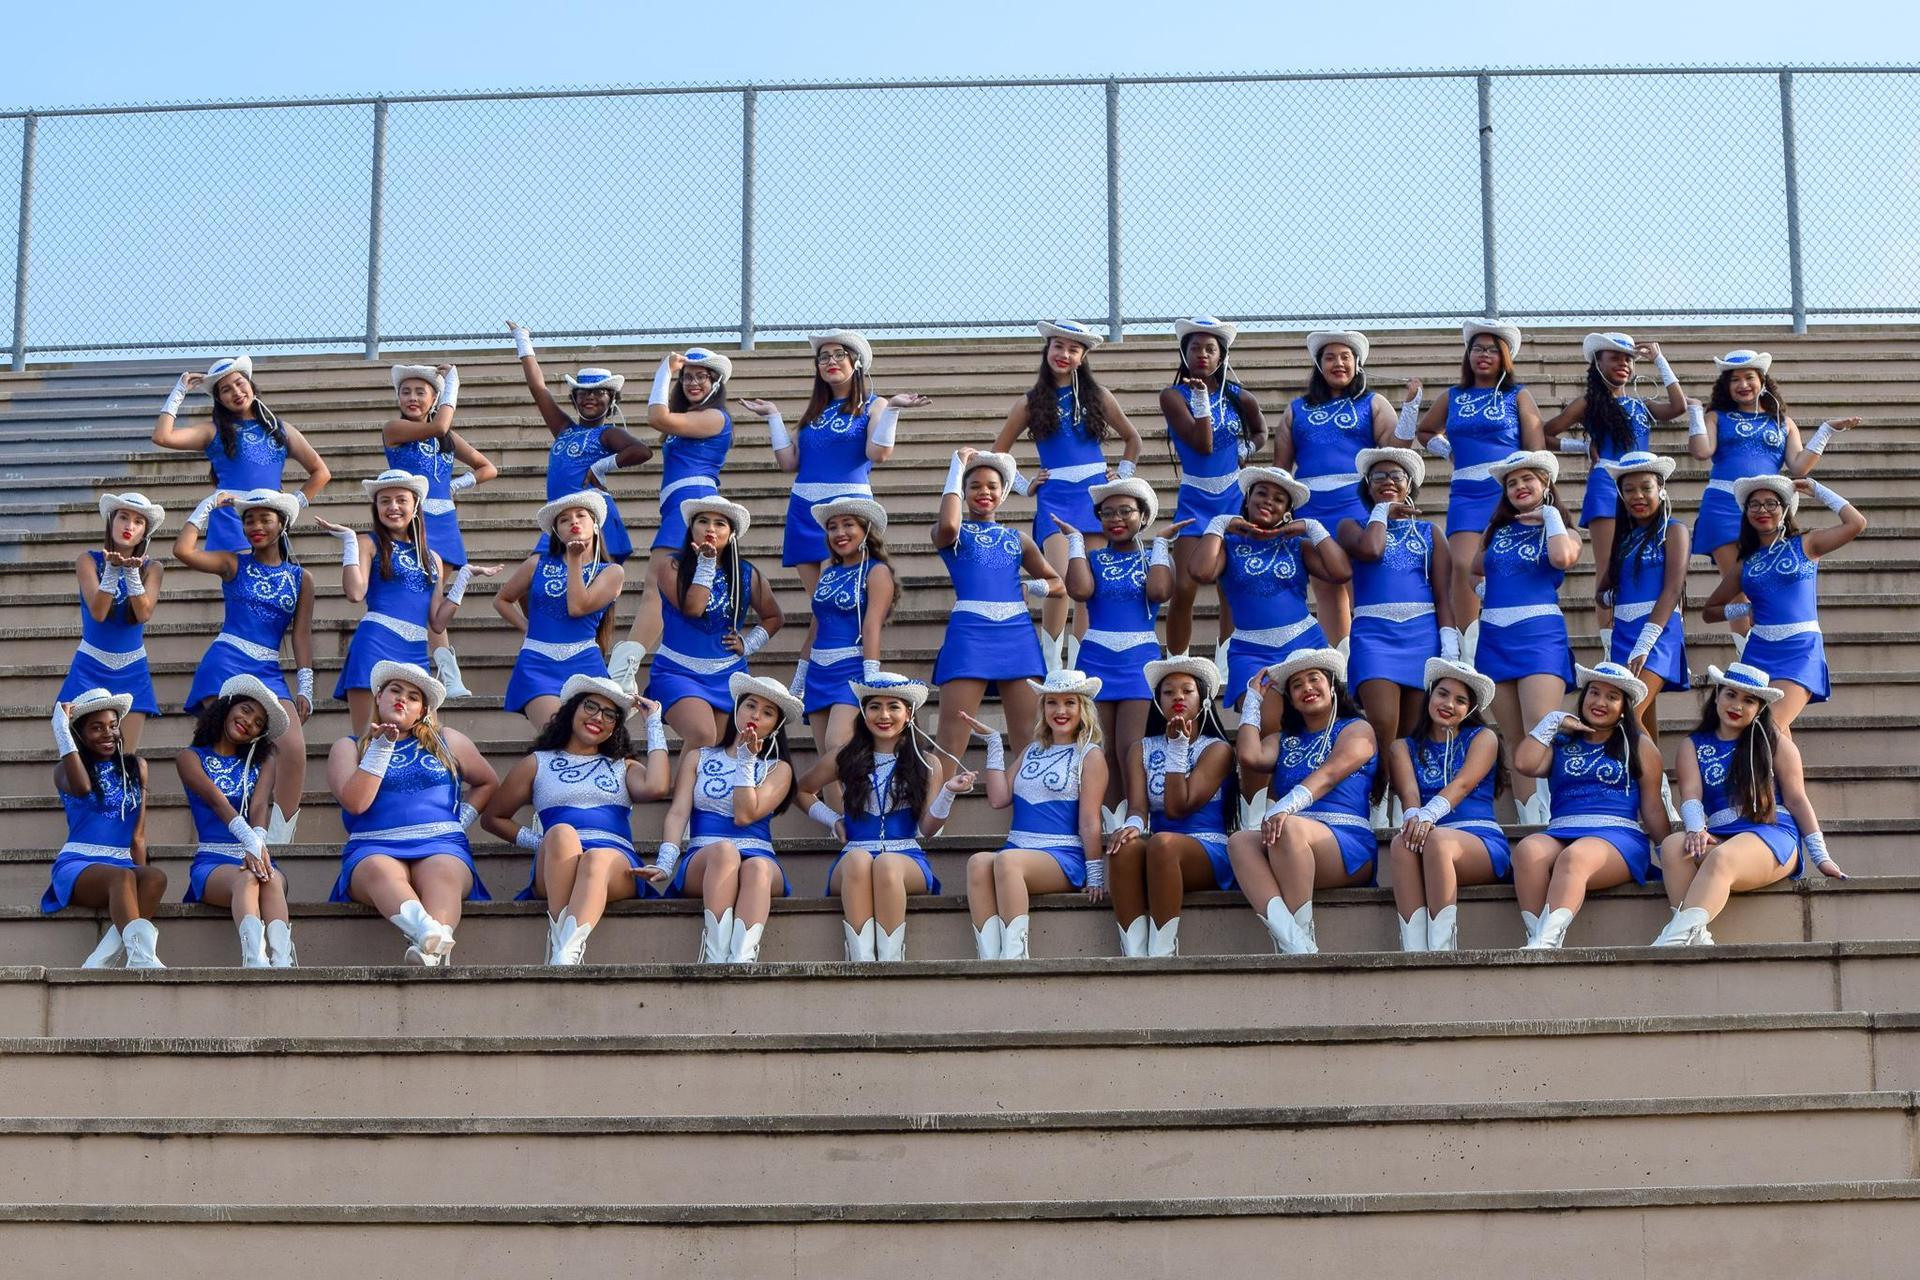 18-19 Pantherettes